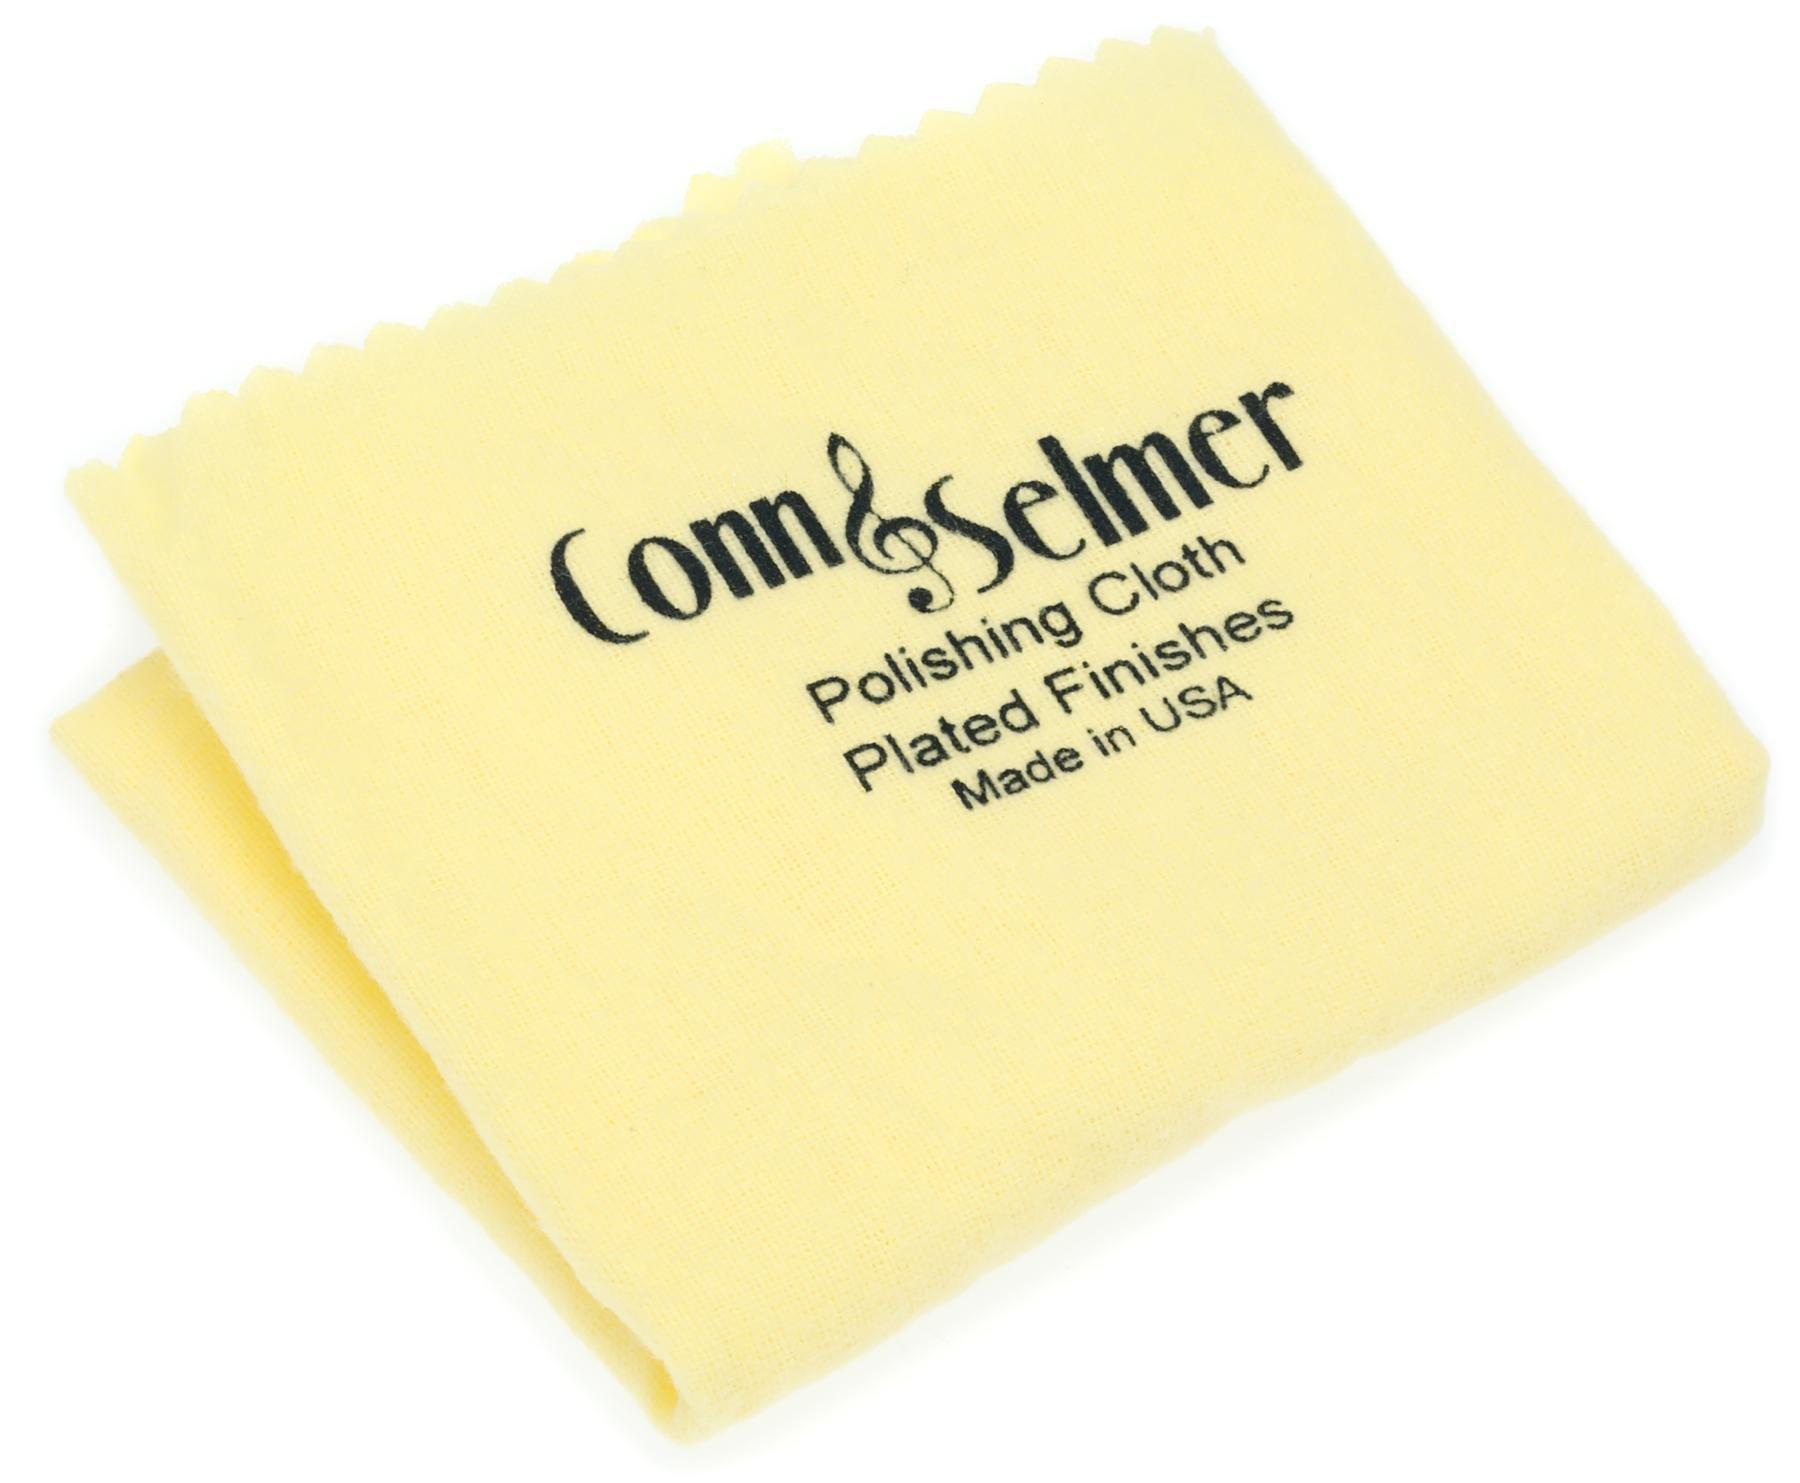 Conn Selmer Silver Polishing Cloth